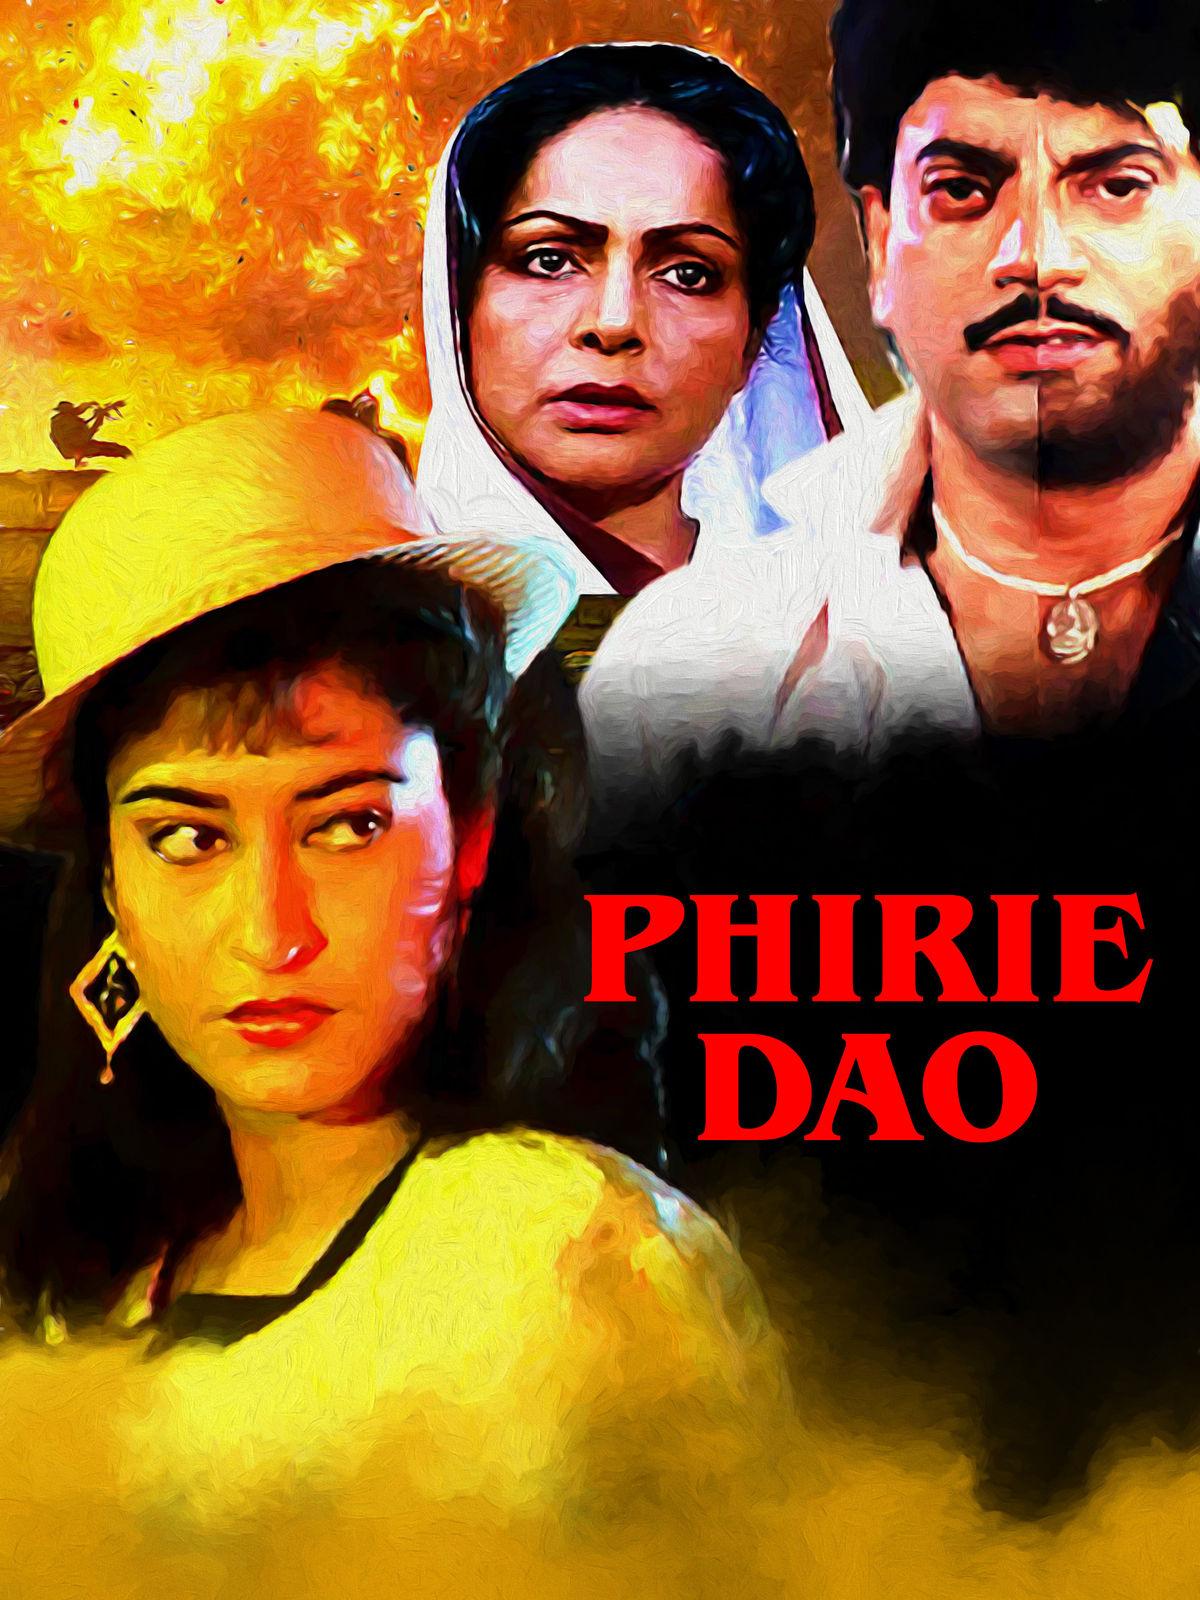 Phirie Dao